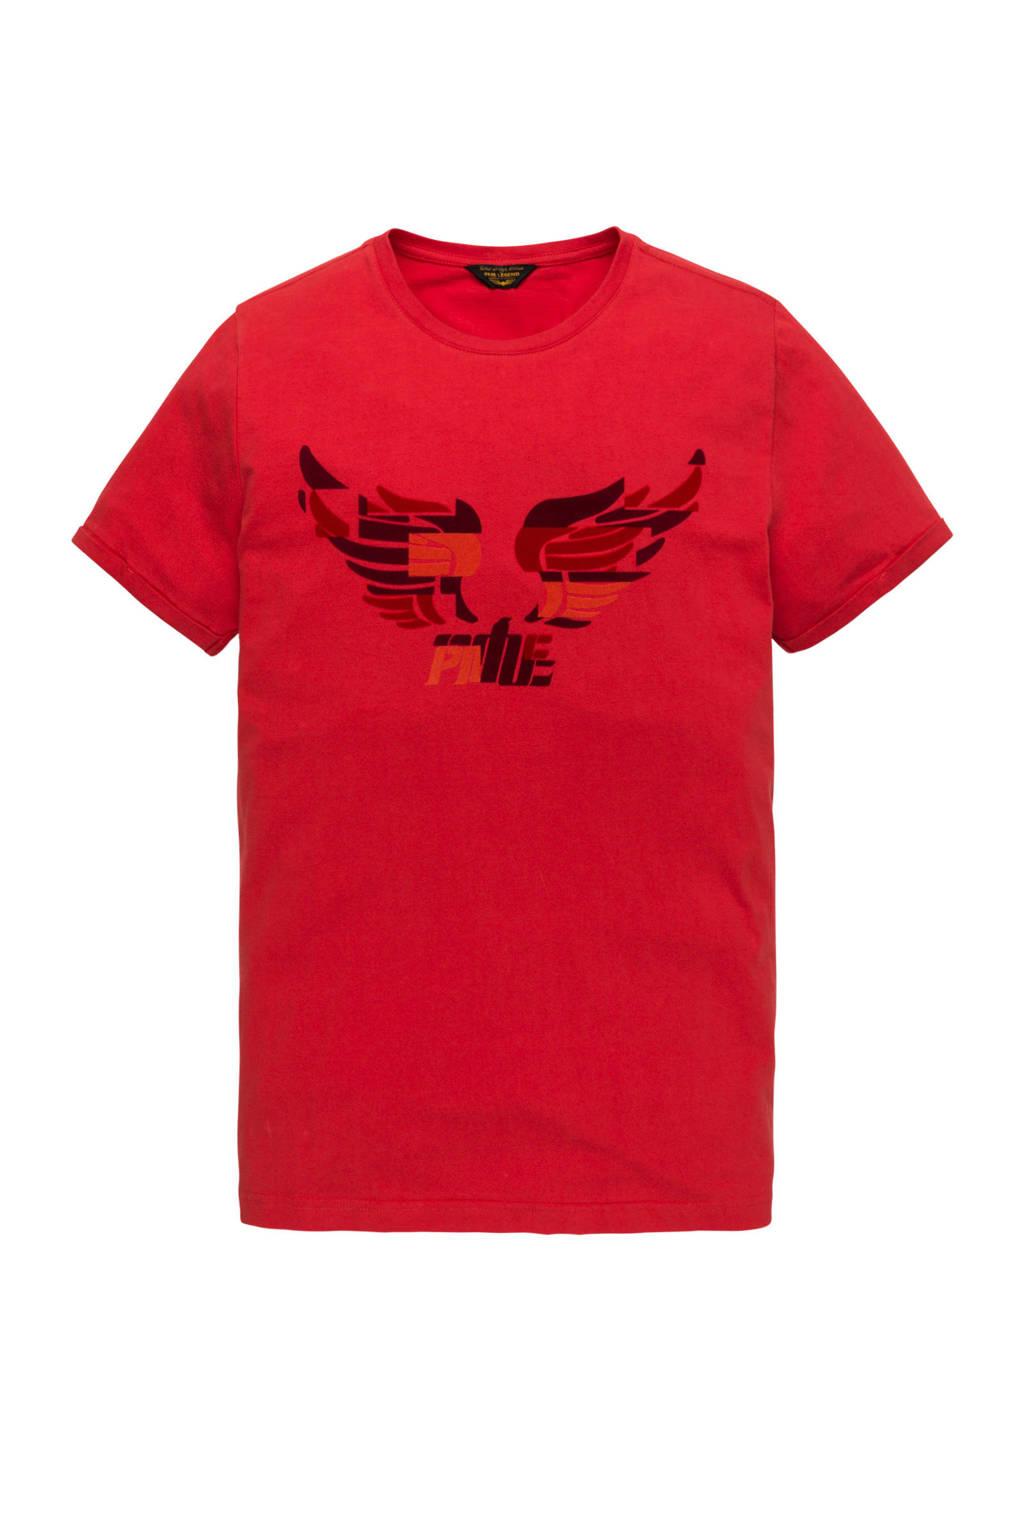 PME Legend T-shirt met logo rood, Rood